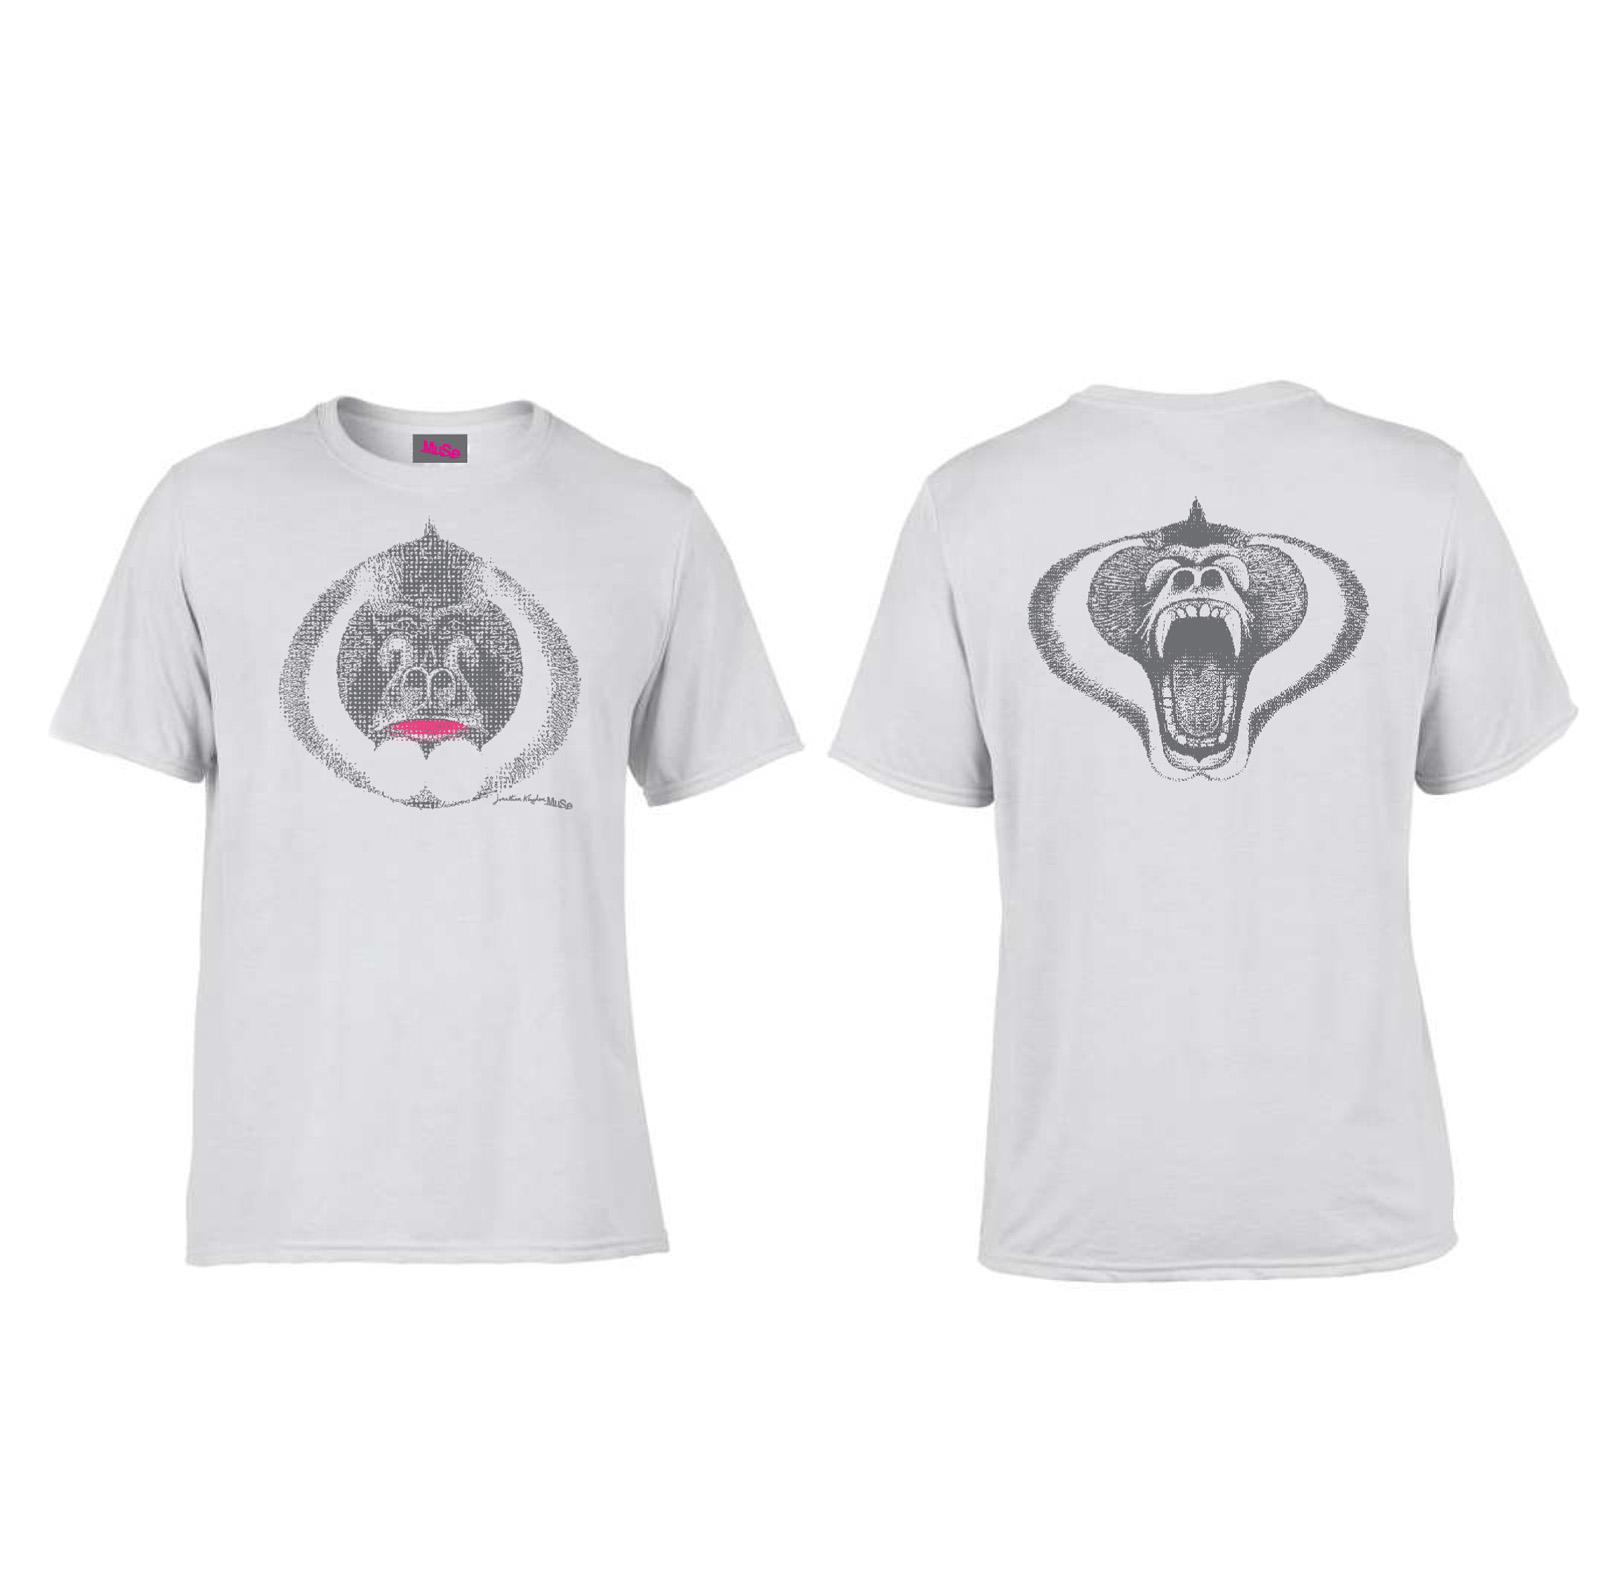 t-shirt-muse-kingdon